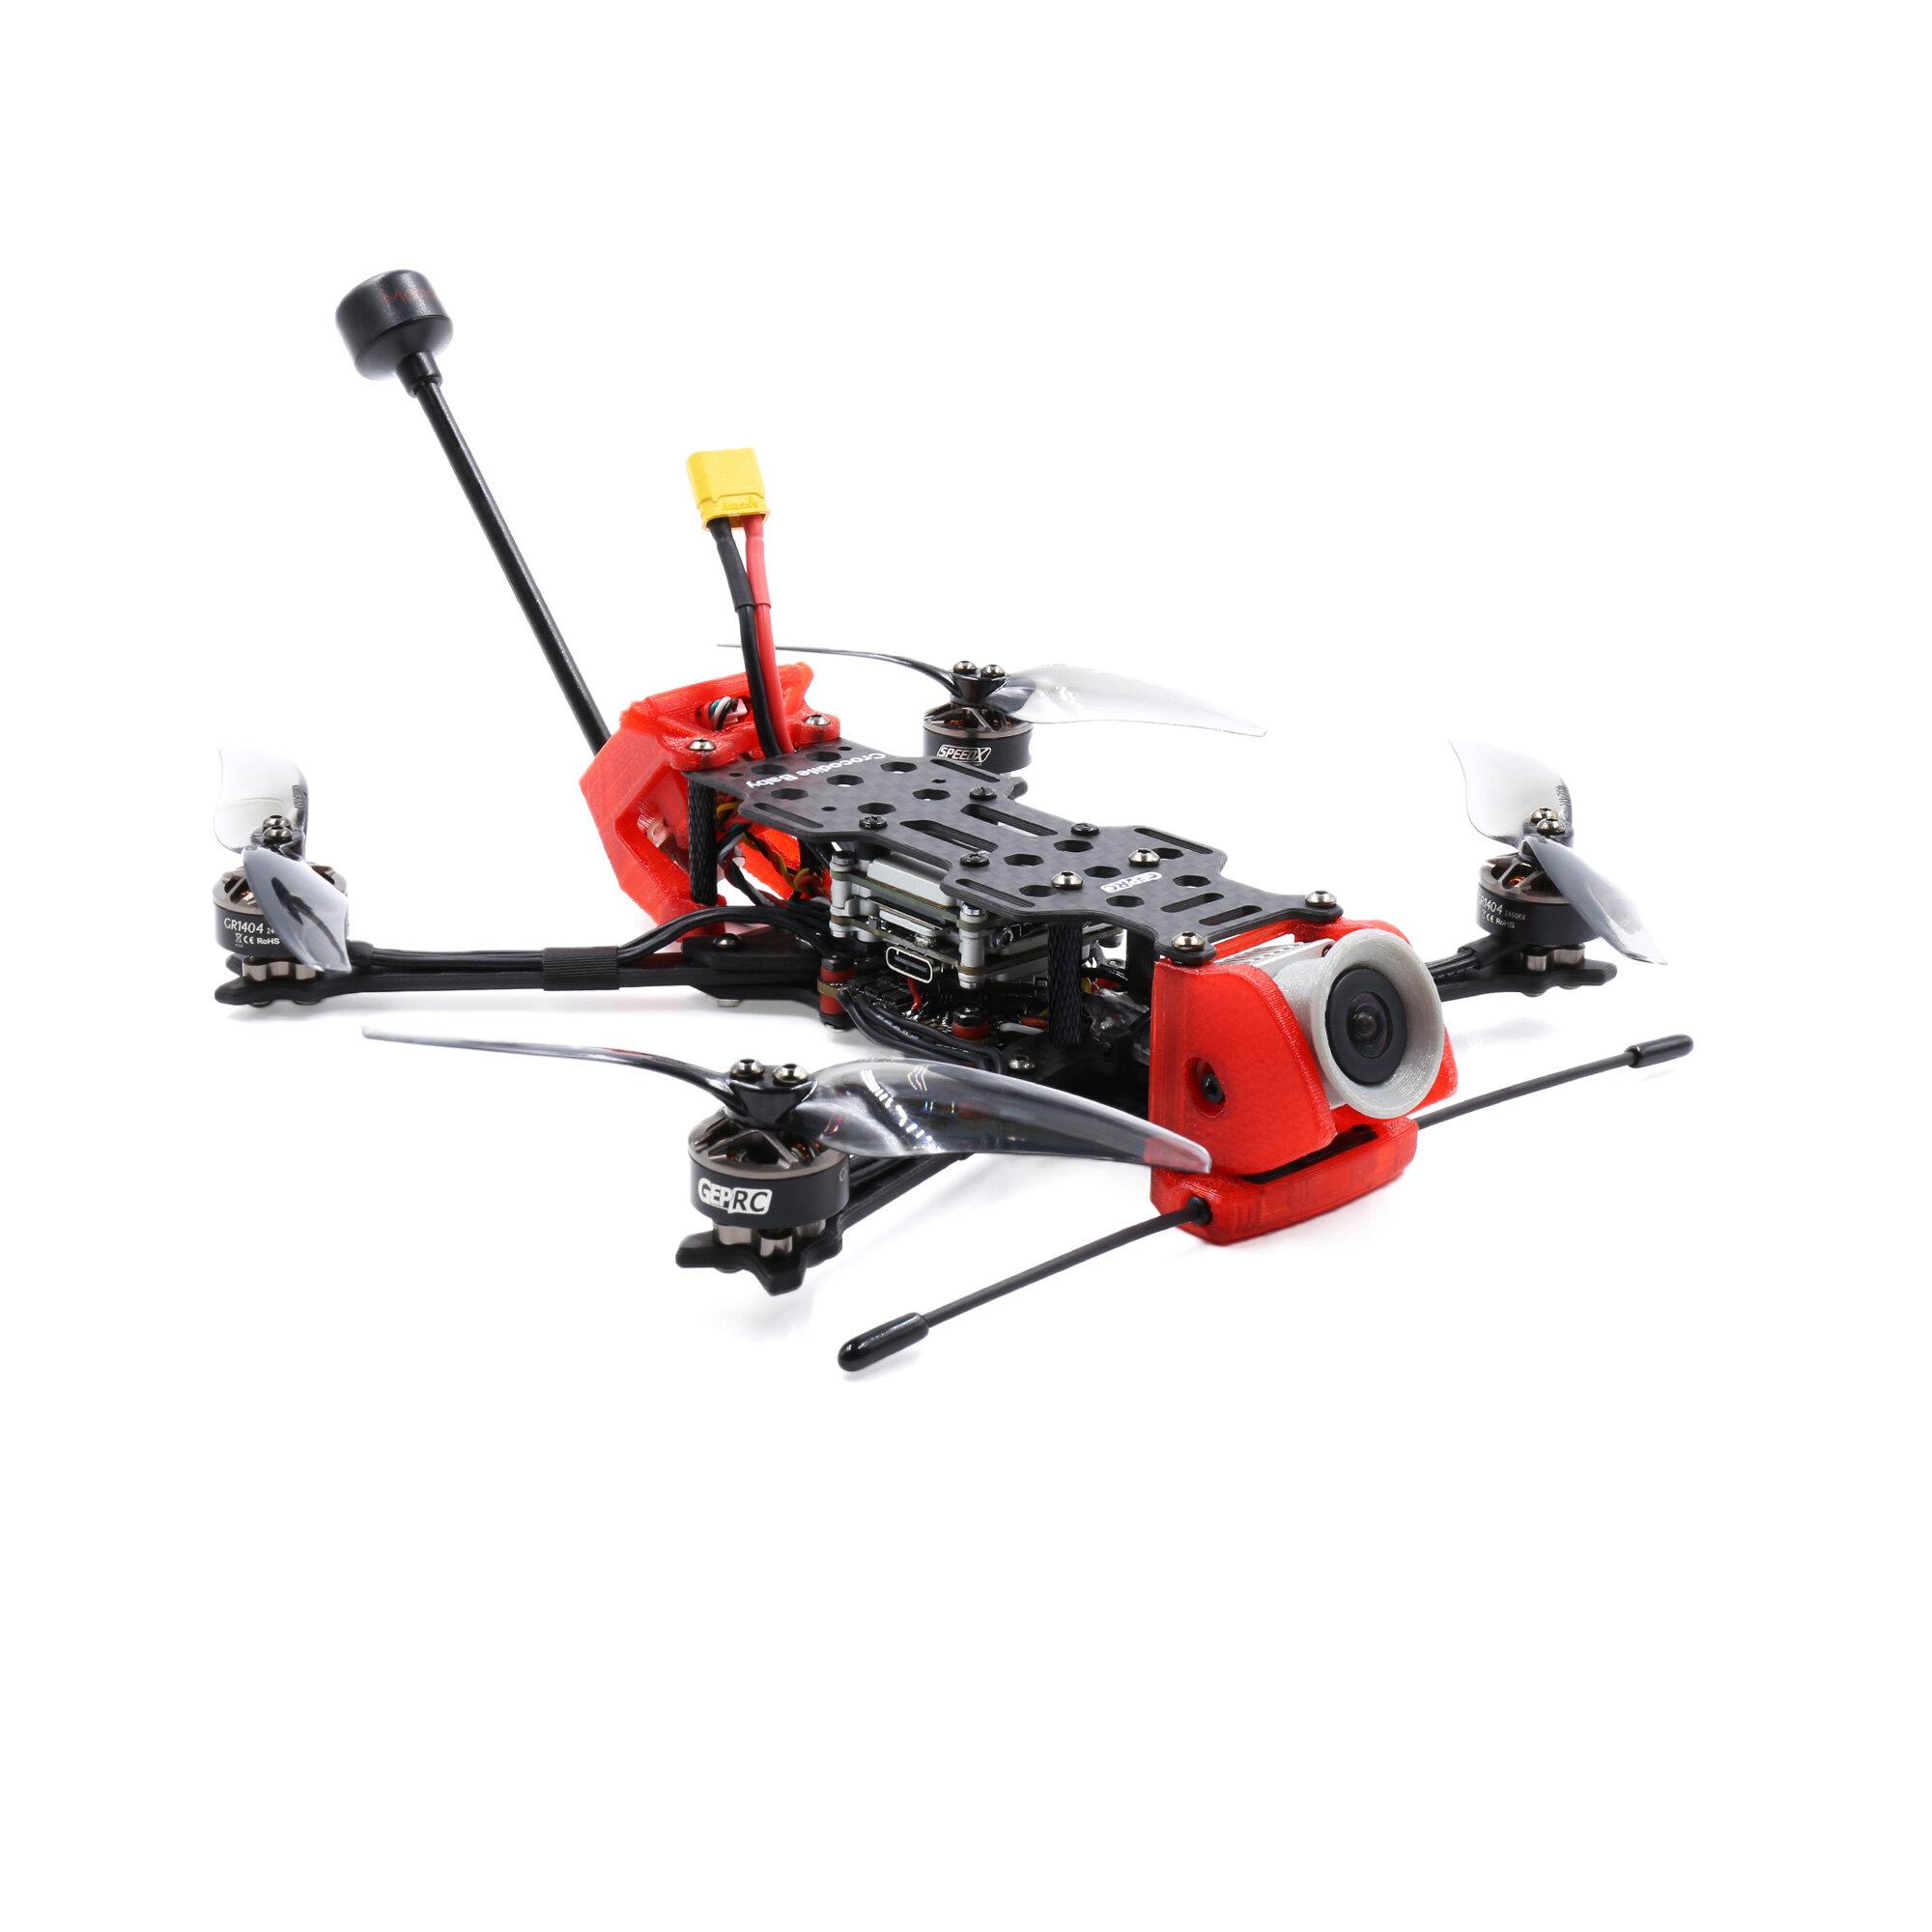 1GEPRC Crocodile Baby 4 Inch HD 4S LR Micro Long Range Freestyle FPV Racing Drone PNP/BNF CADDX VISTA DJI F4 FC 20A ESC 1404 2750KV Motor Sub 250g